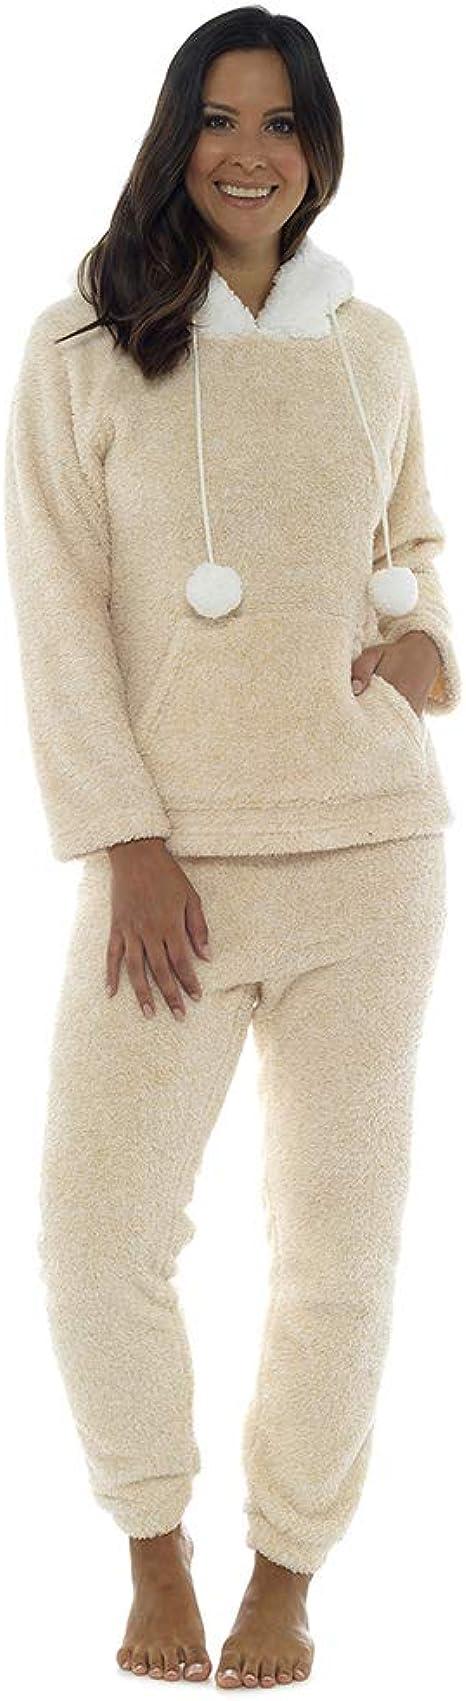 Socks Uwear - Pijama de una pieza - Liso - para mujer